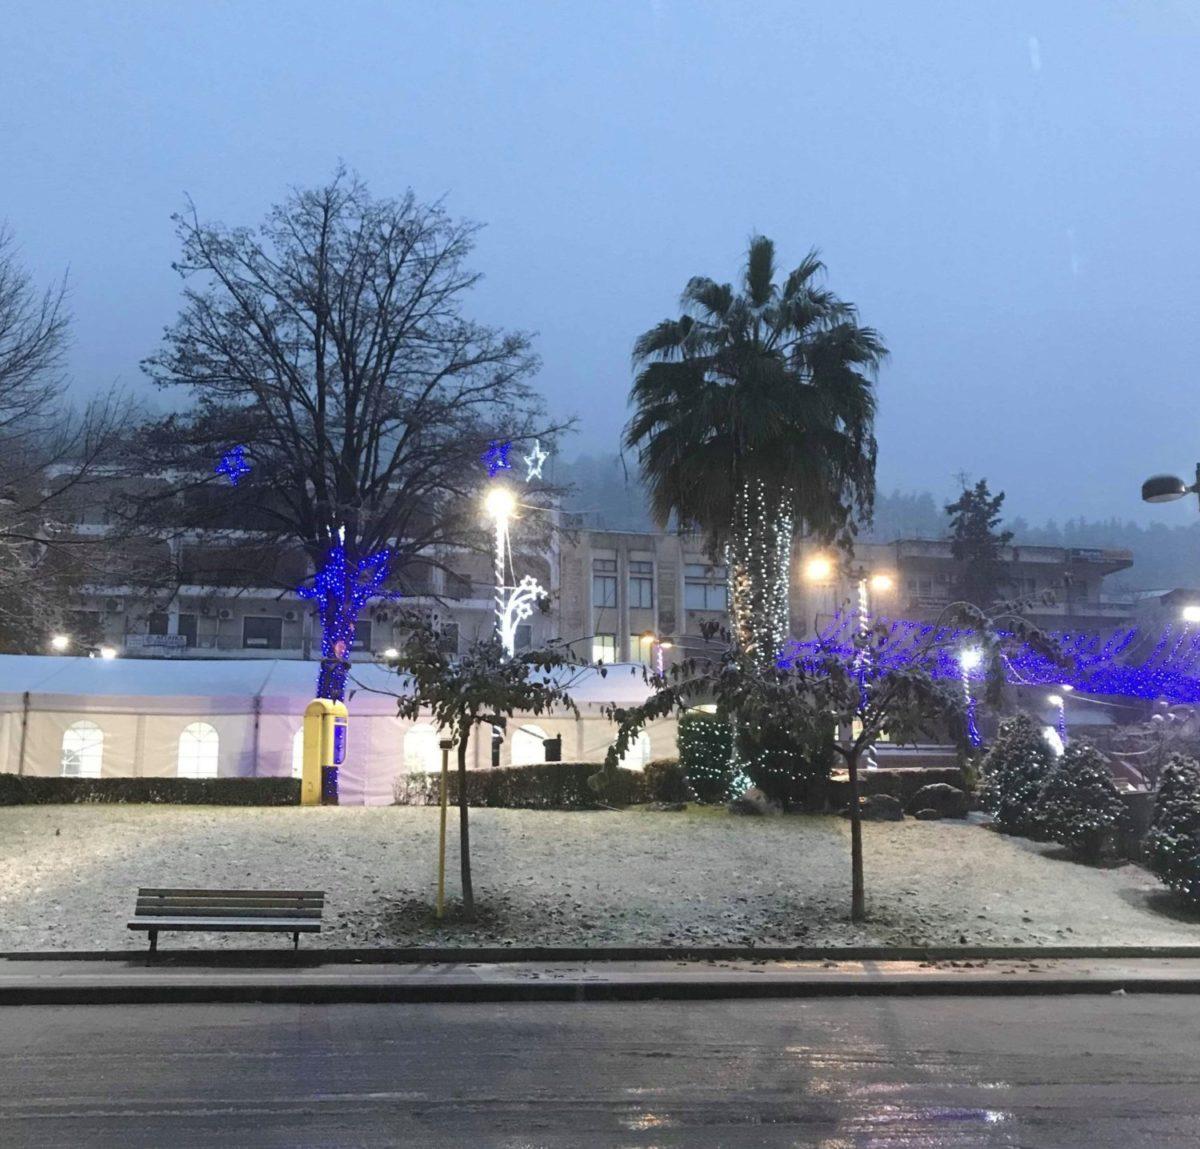 201901030550533635 1200x1149 - Χιονίζει σε όλη την επαρχία Φαρσάλων